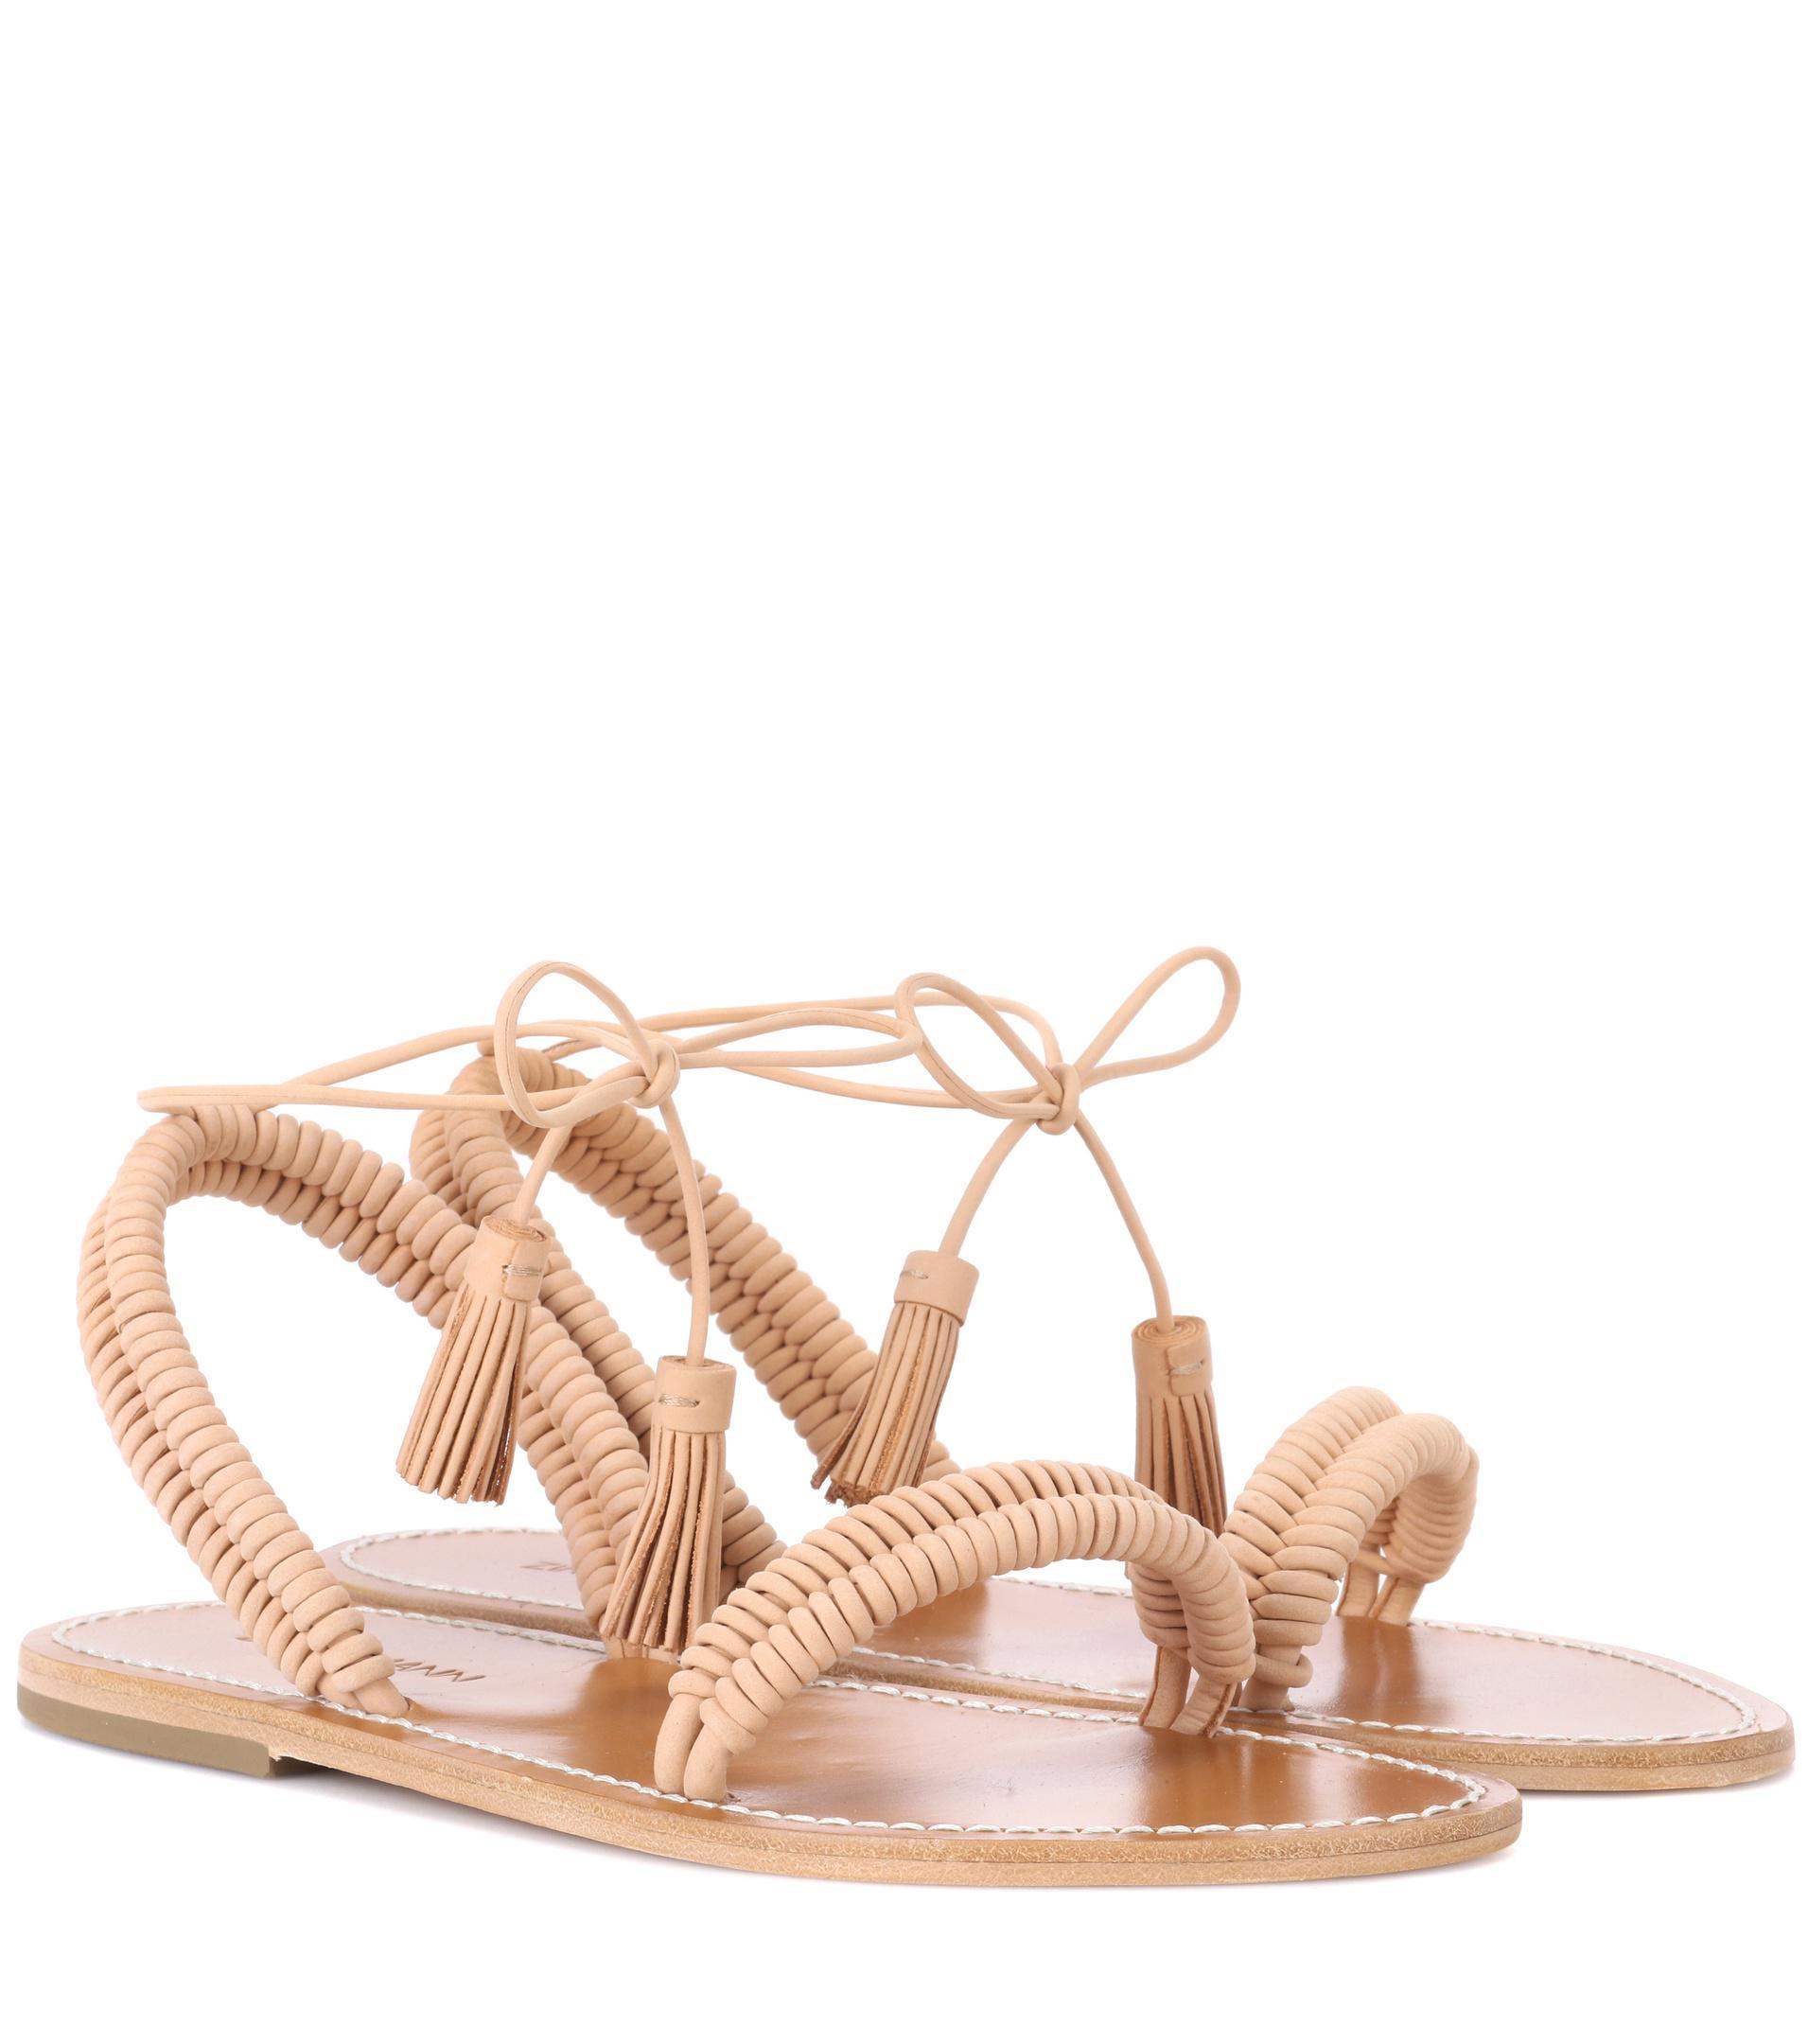 ZIMMERMANN Wrap Weave leather sandals 3Nkv7dD